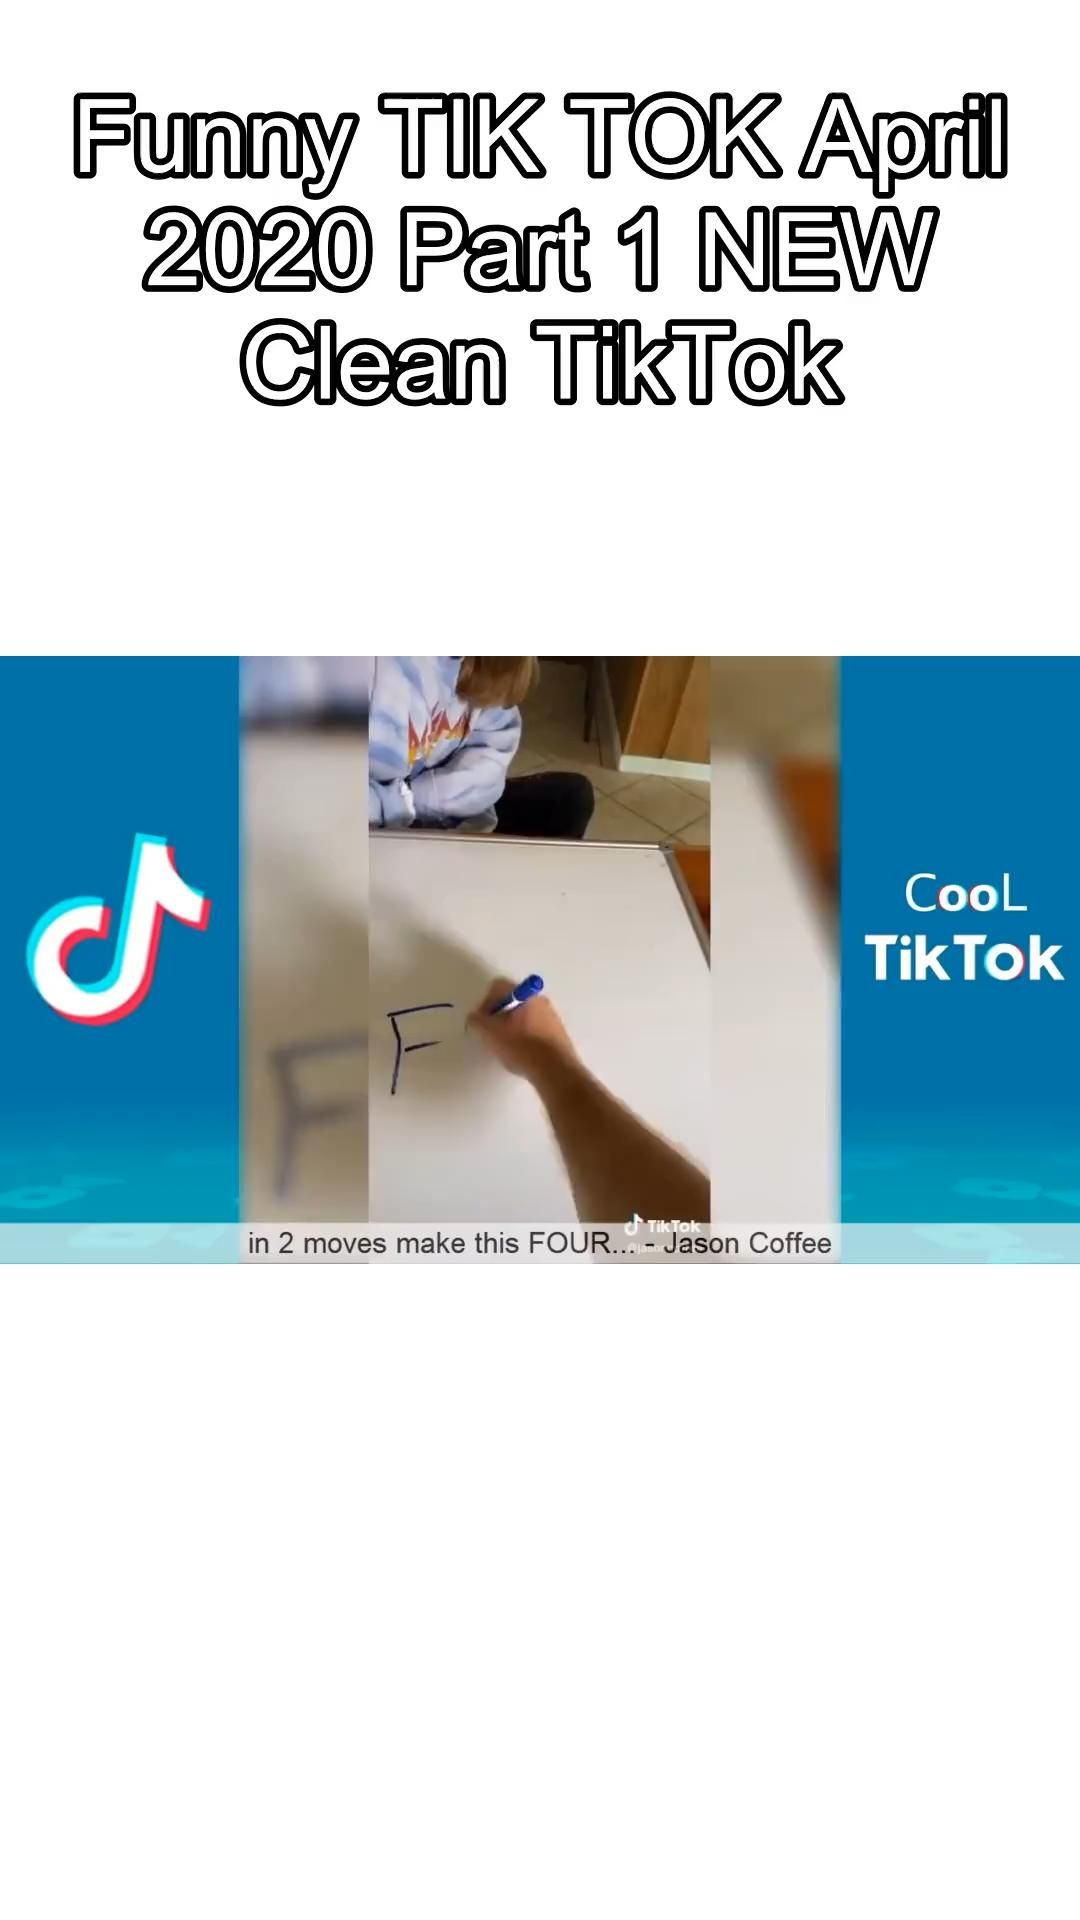 Funny Tik Tok April 2020 Part 1 New Clean Tiktok Video In 2020 Funny Videos Clean Really Funny Joke Really Funny Texts